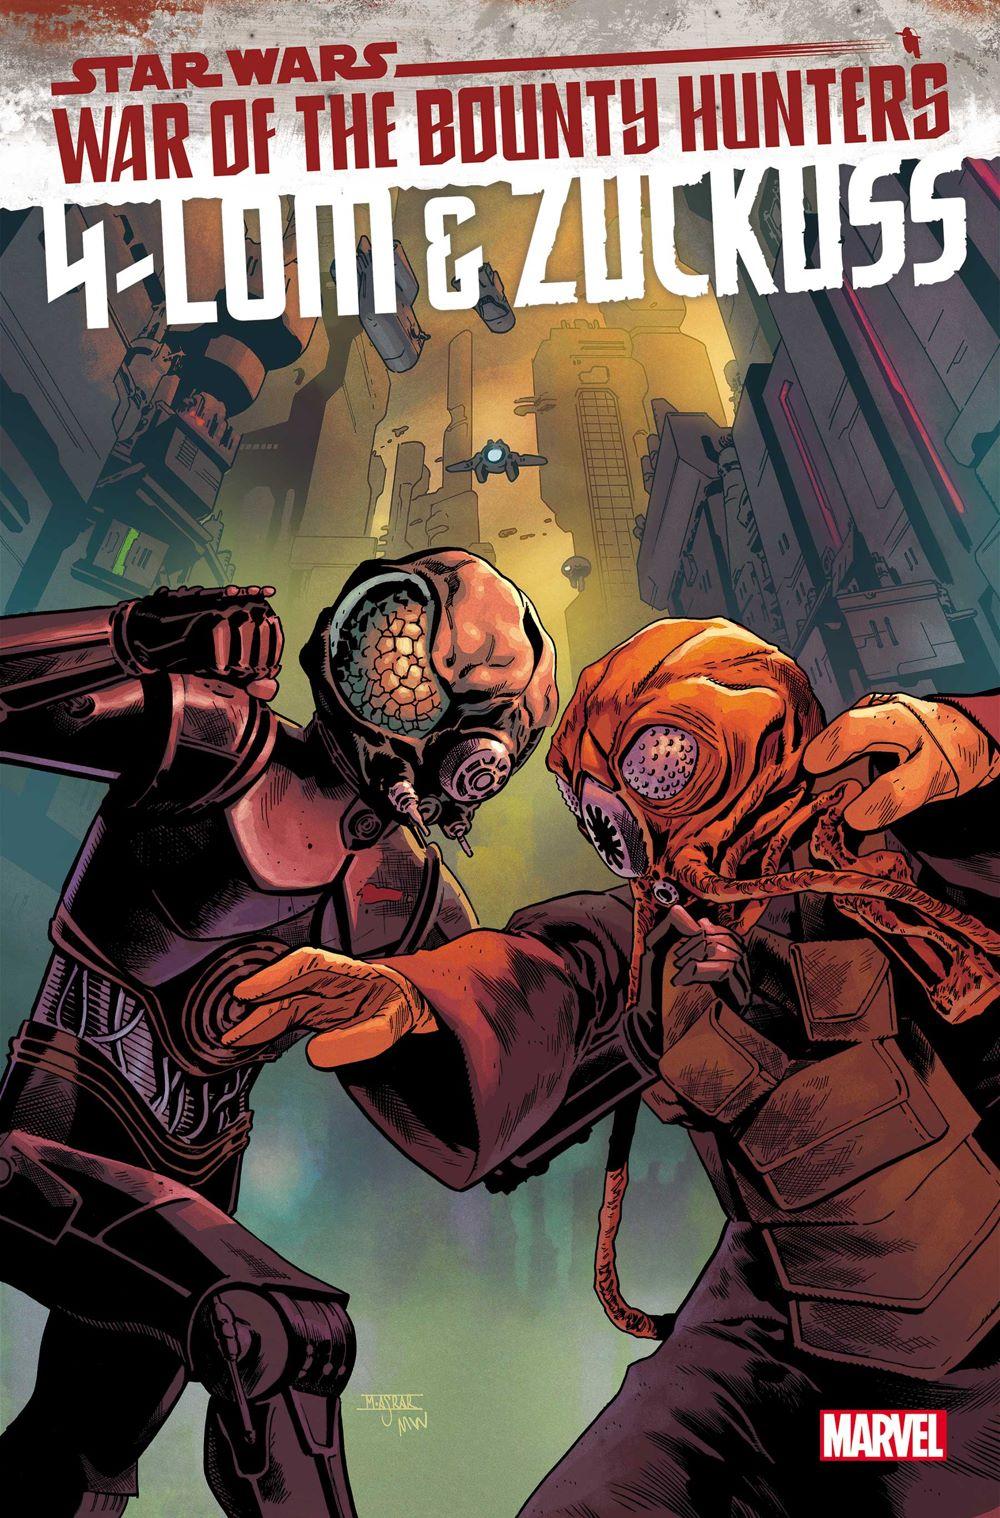 STWWAROTBH4LOMZUCK001 Marvel Comics August 2021 Solicitations